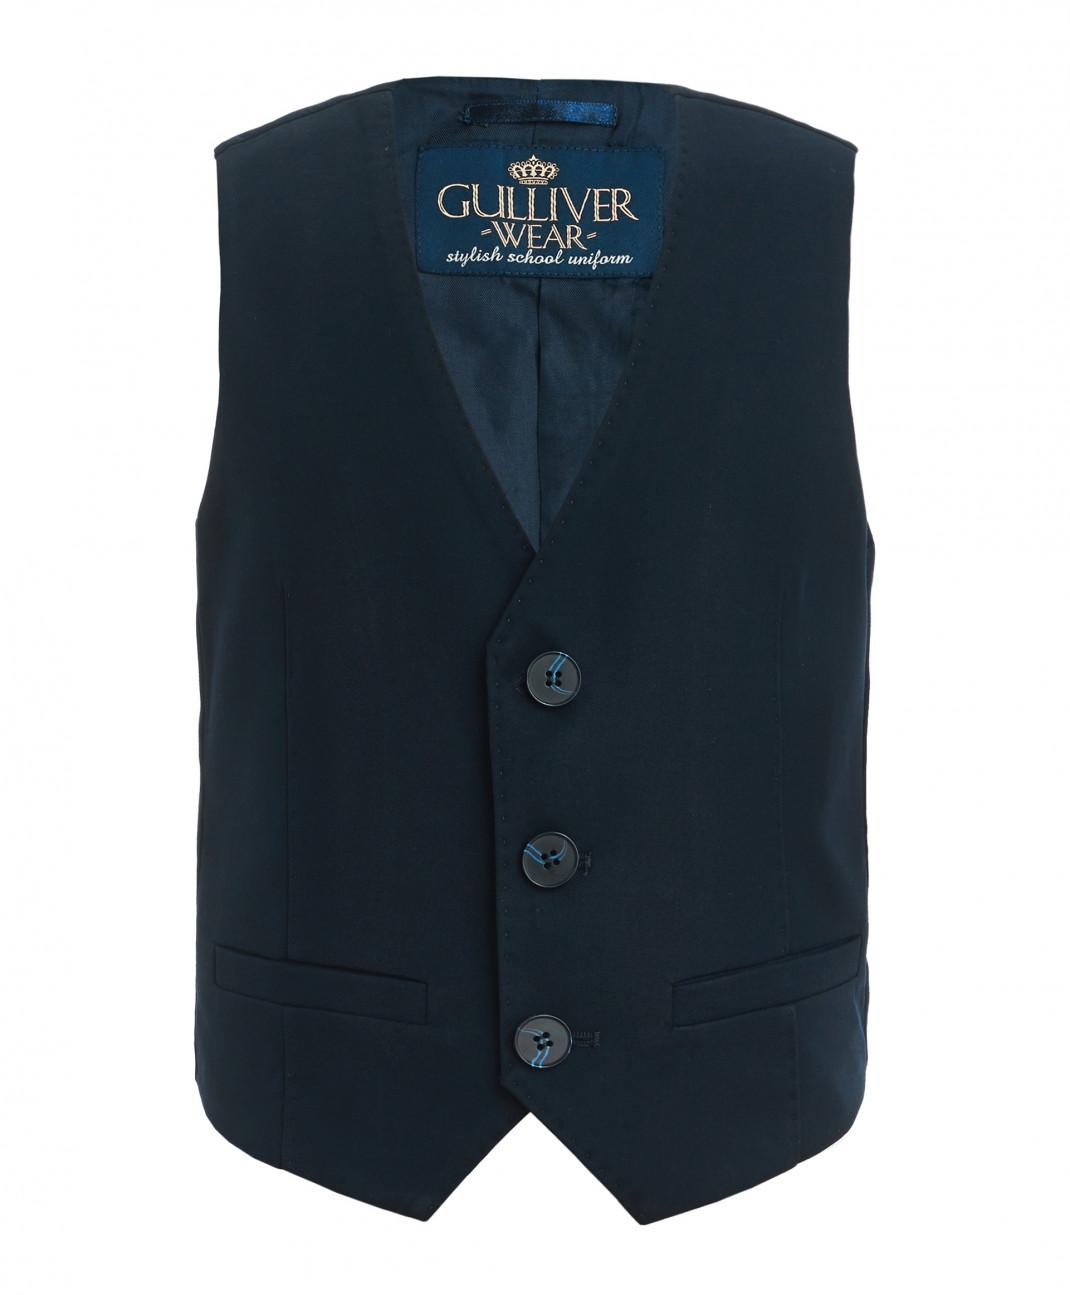 Gulliver Синий классический жилет Gulliver